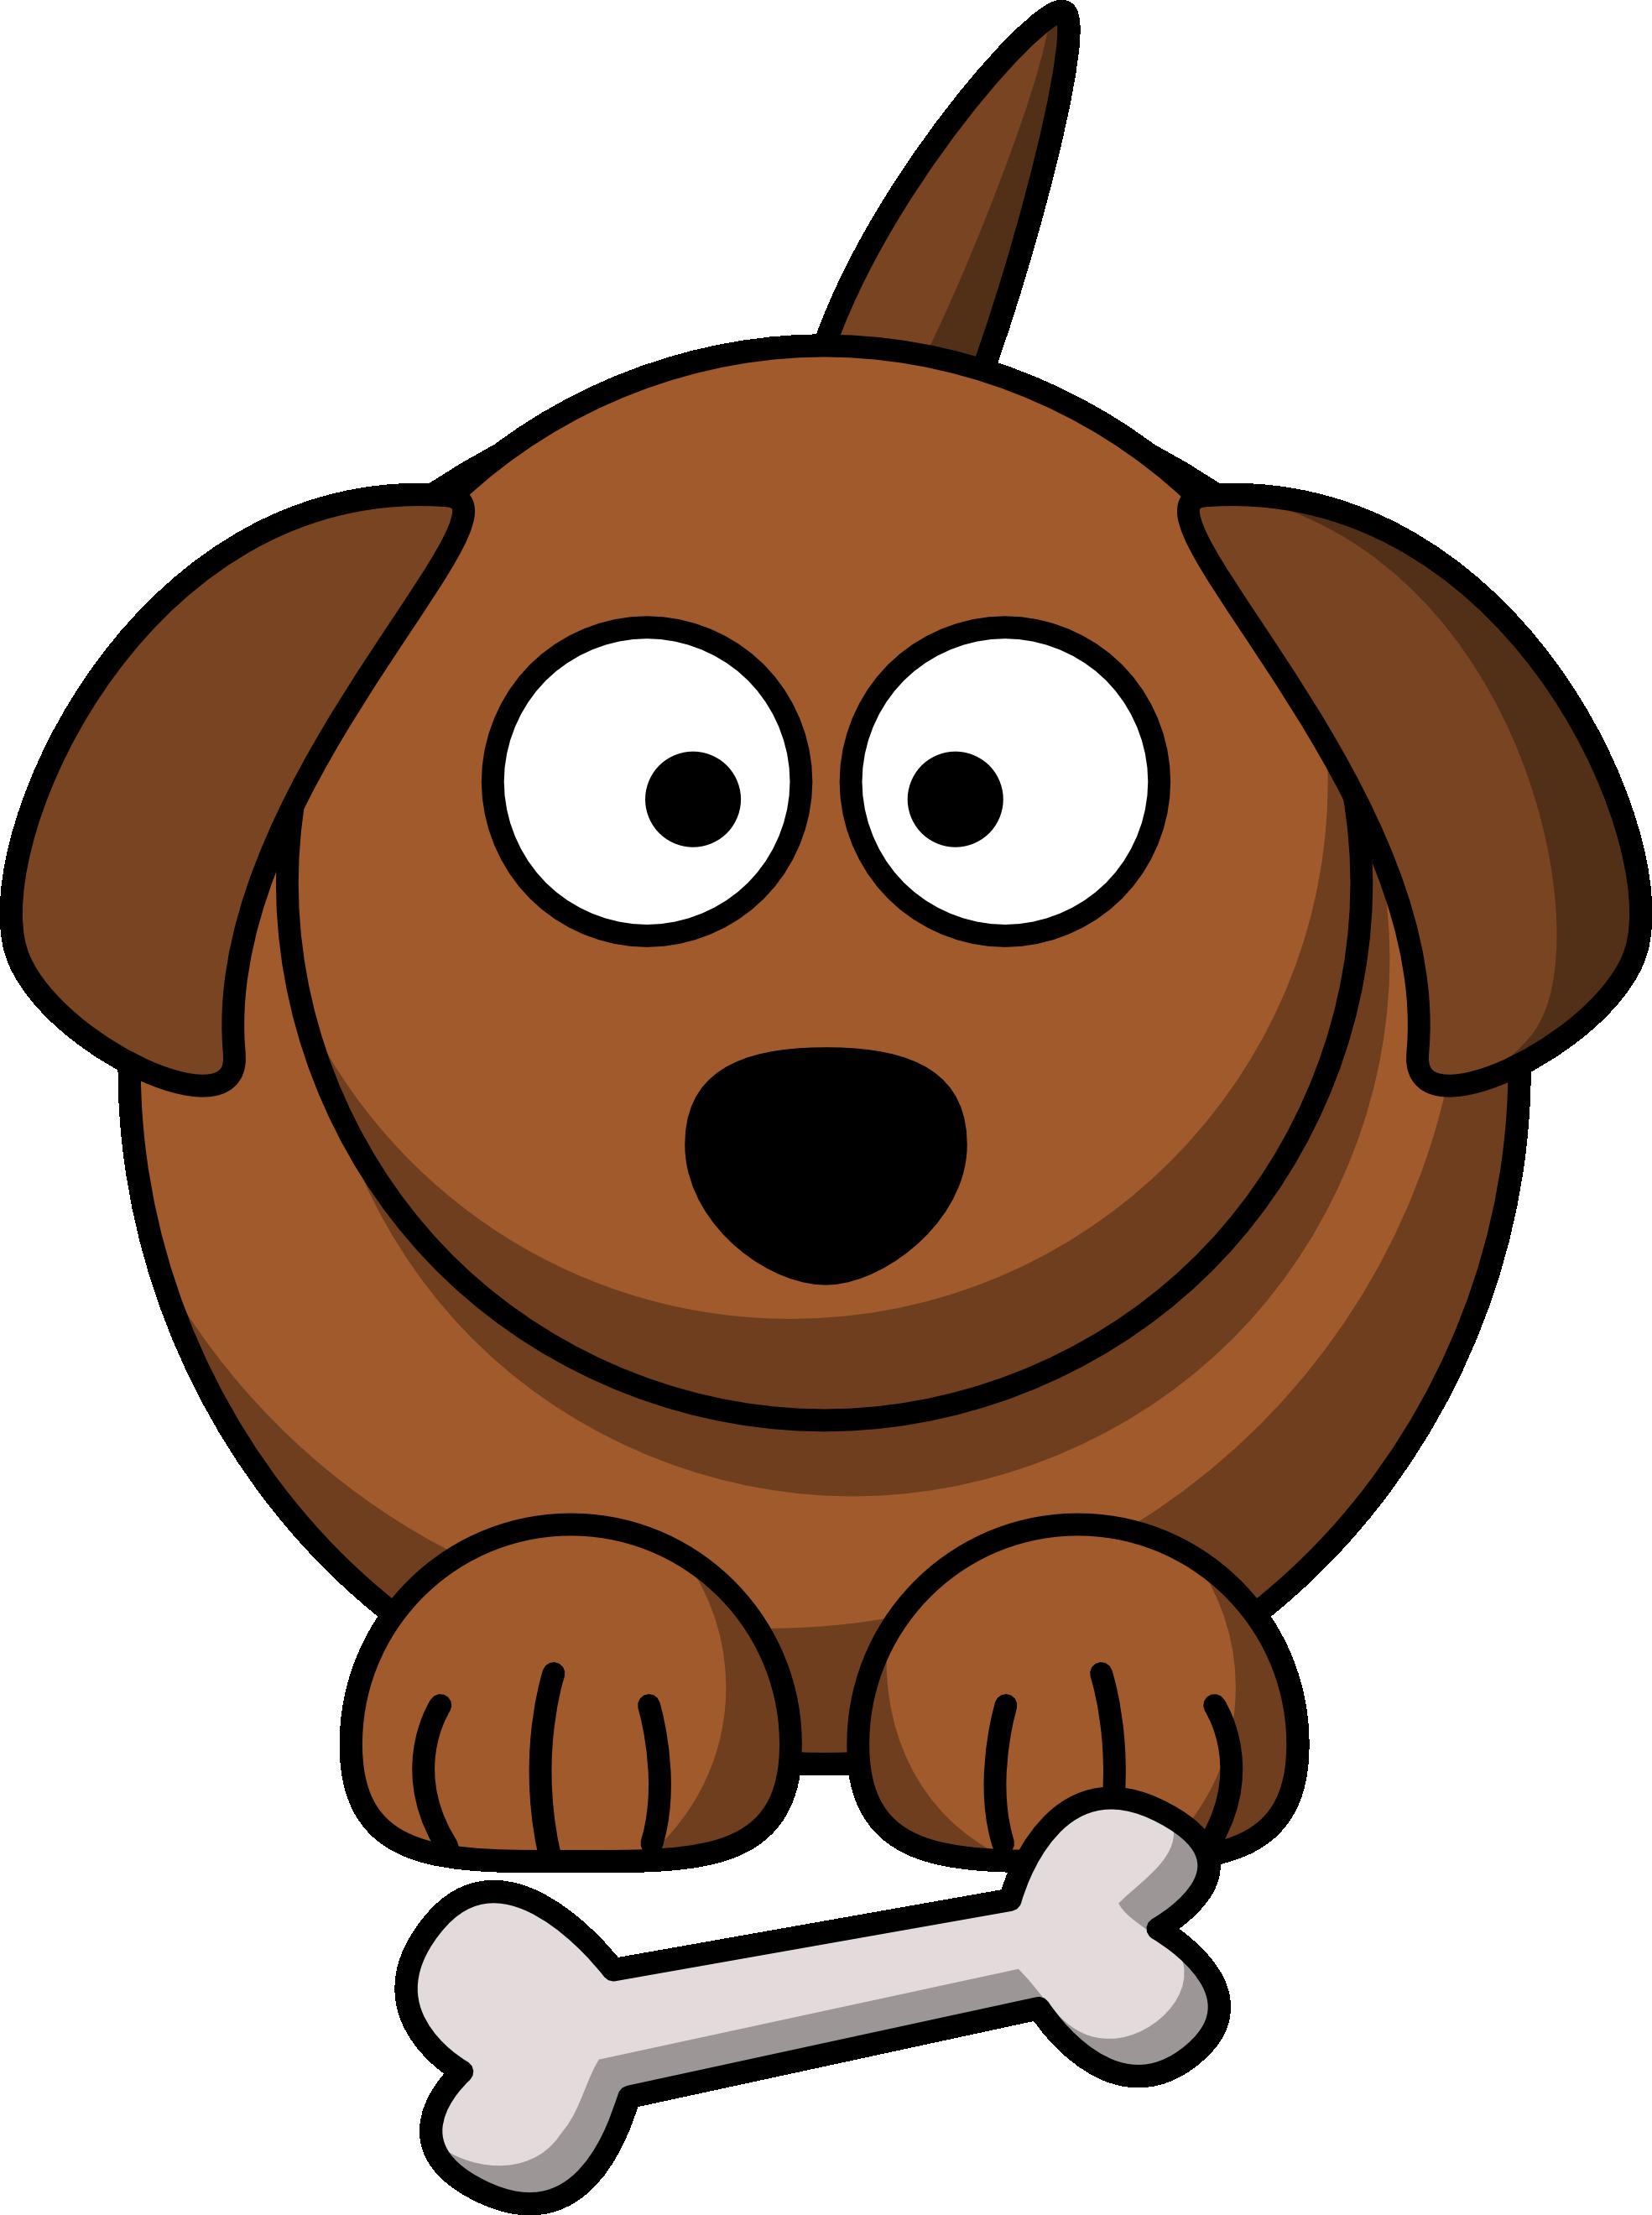 Cute Dog And Cat Clip Art | Clipart Libr-Cute Dog And Cat Clip Art | Clipart library - Free Clipart Images-4